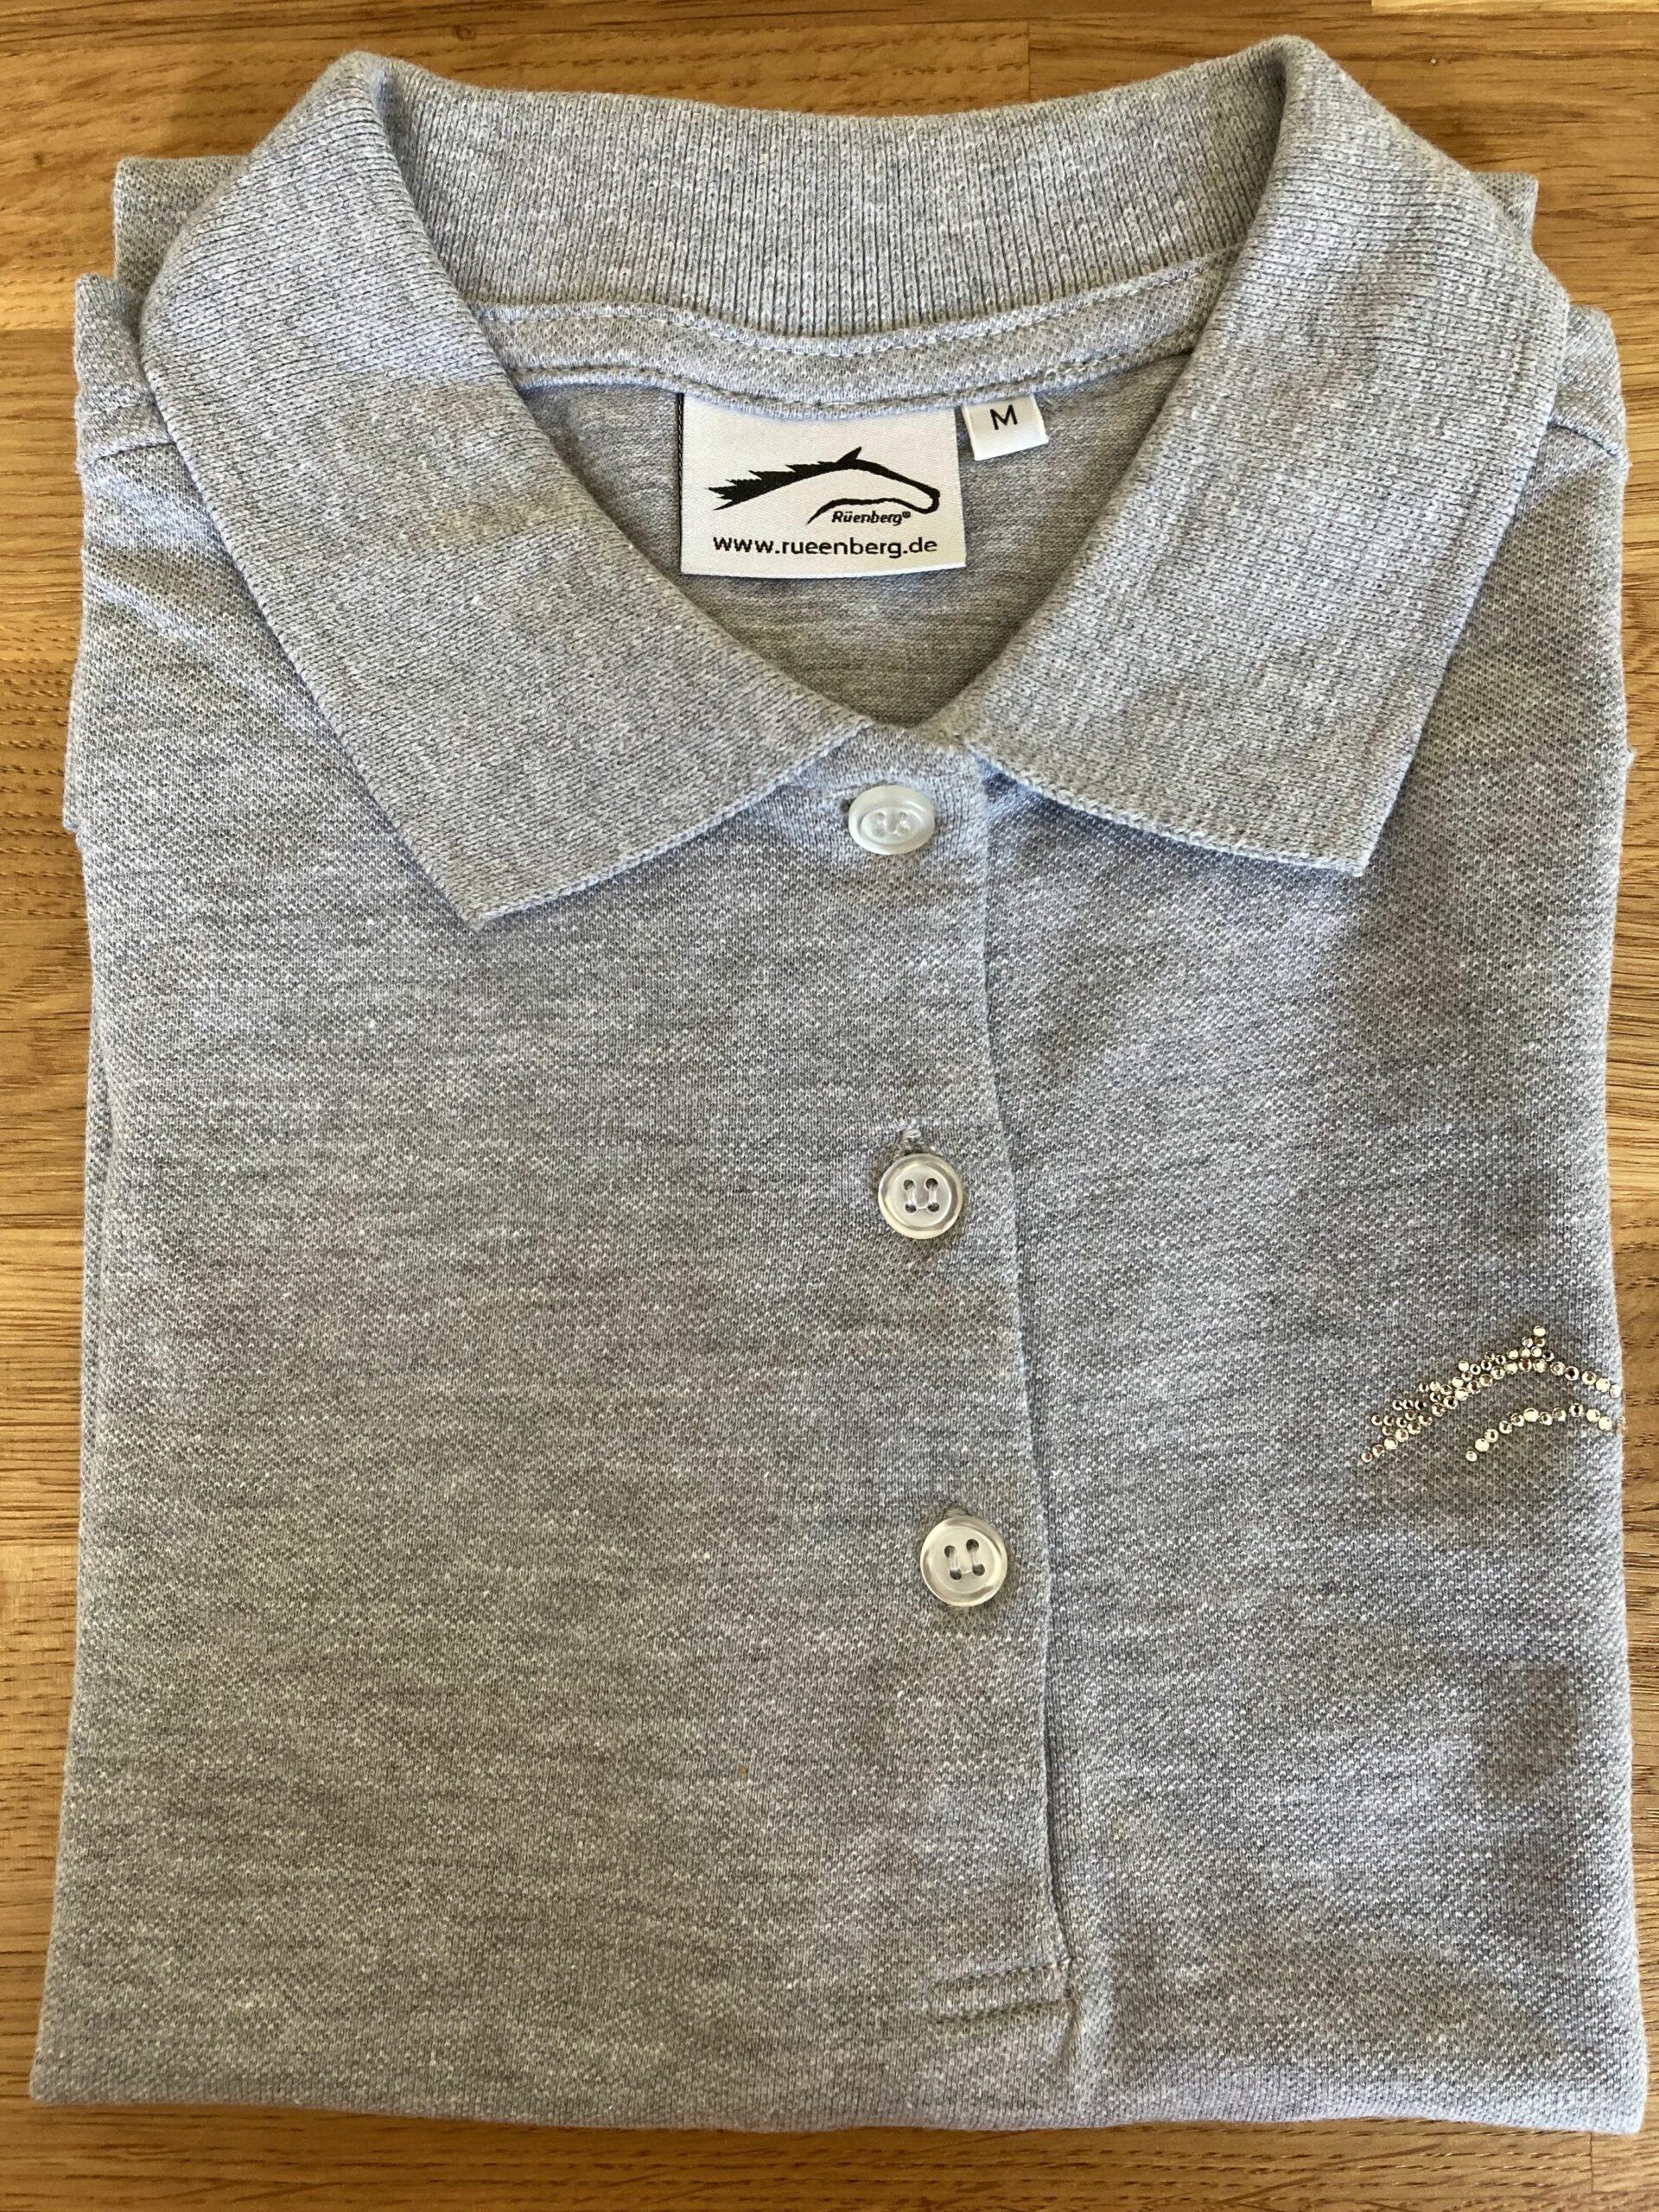 heather grey DIN A4